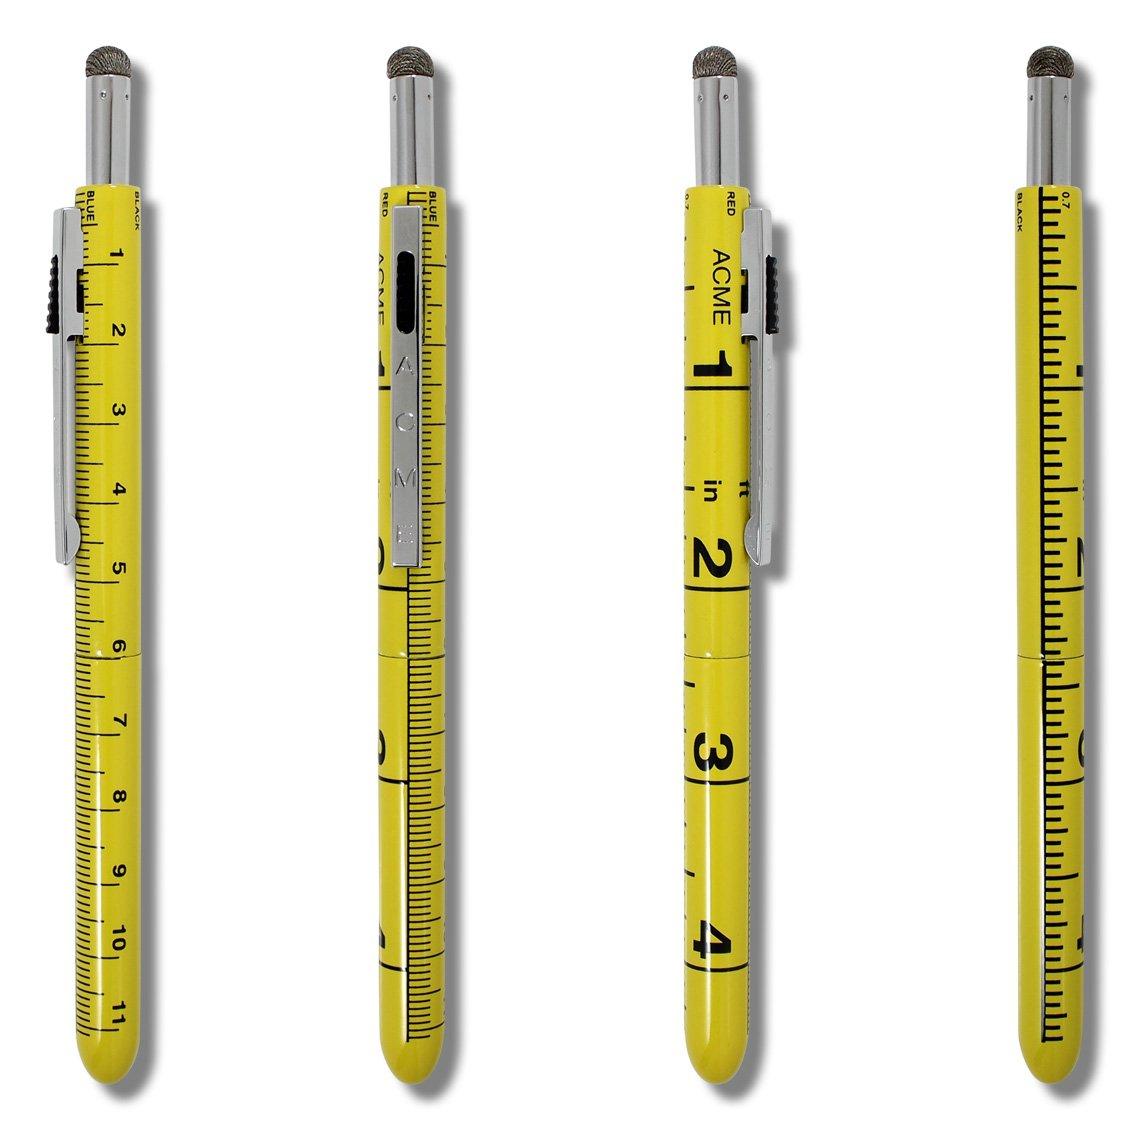 ACME Studios Ruler Seven Function Pen by Adrian Olabuenaga (P7FP04) by ACME Studios Inc (Image #2)